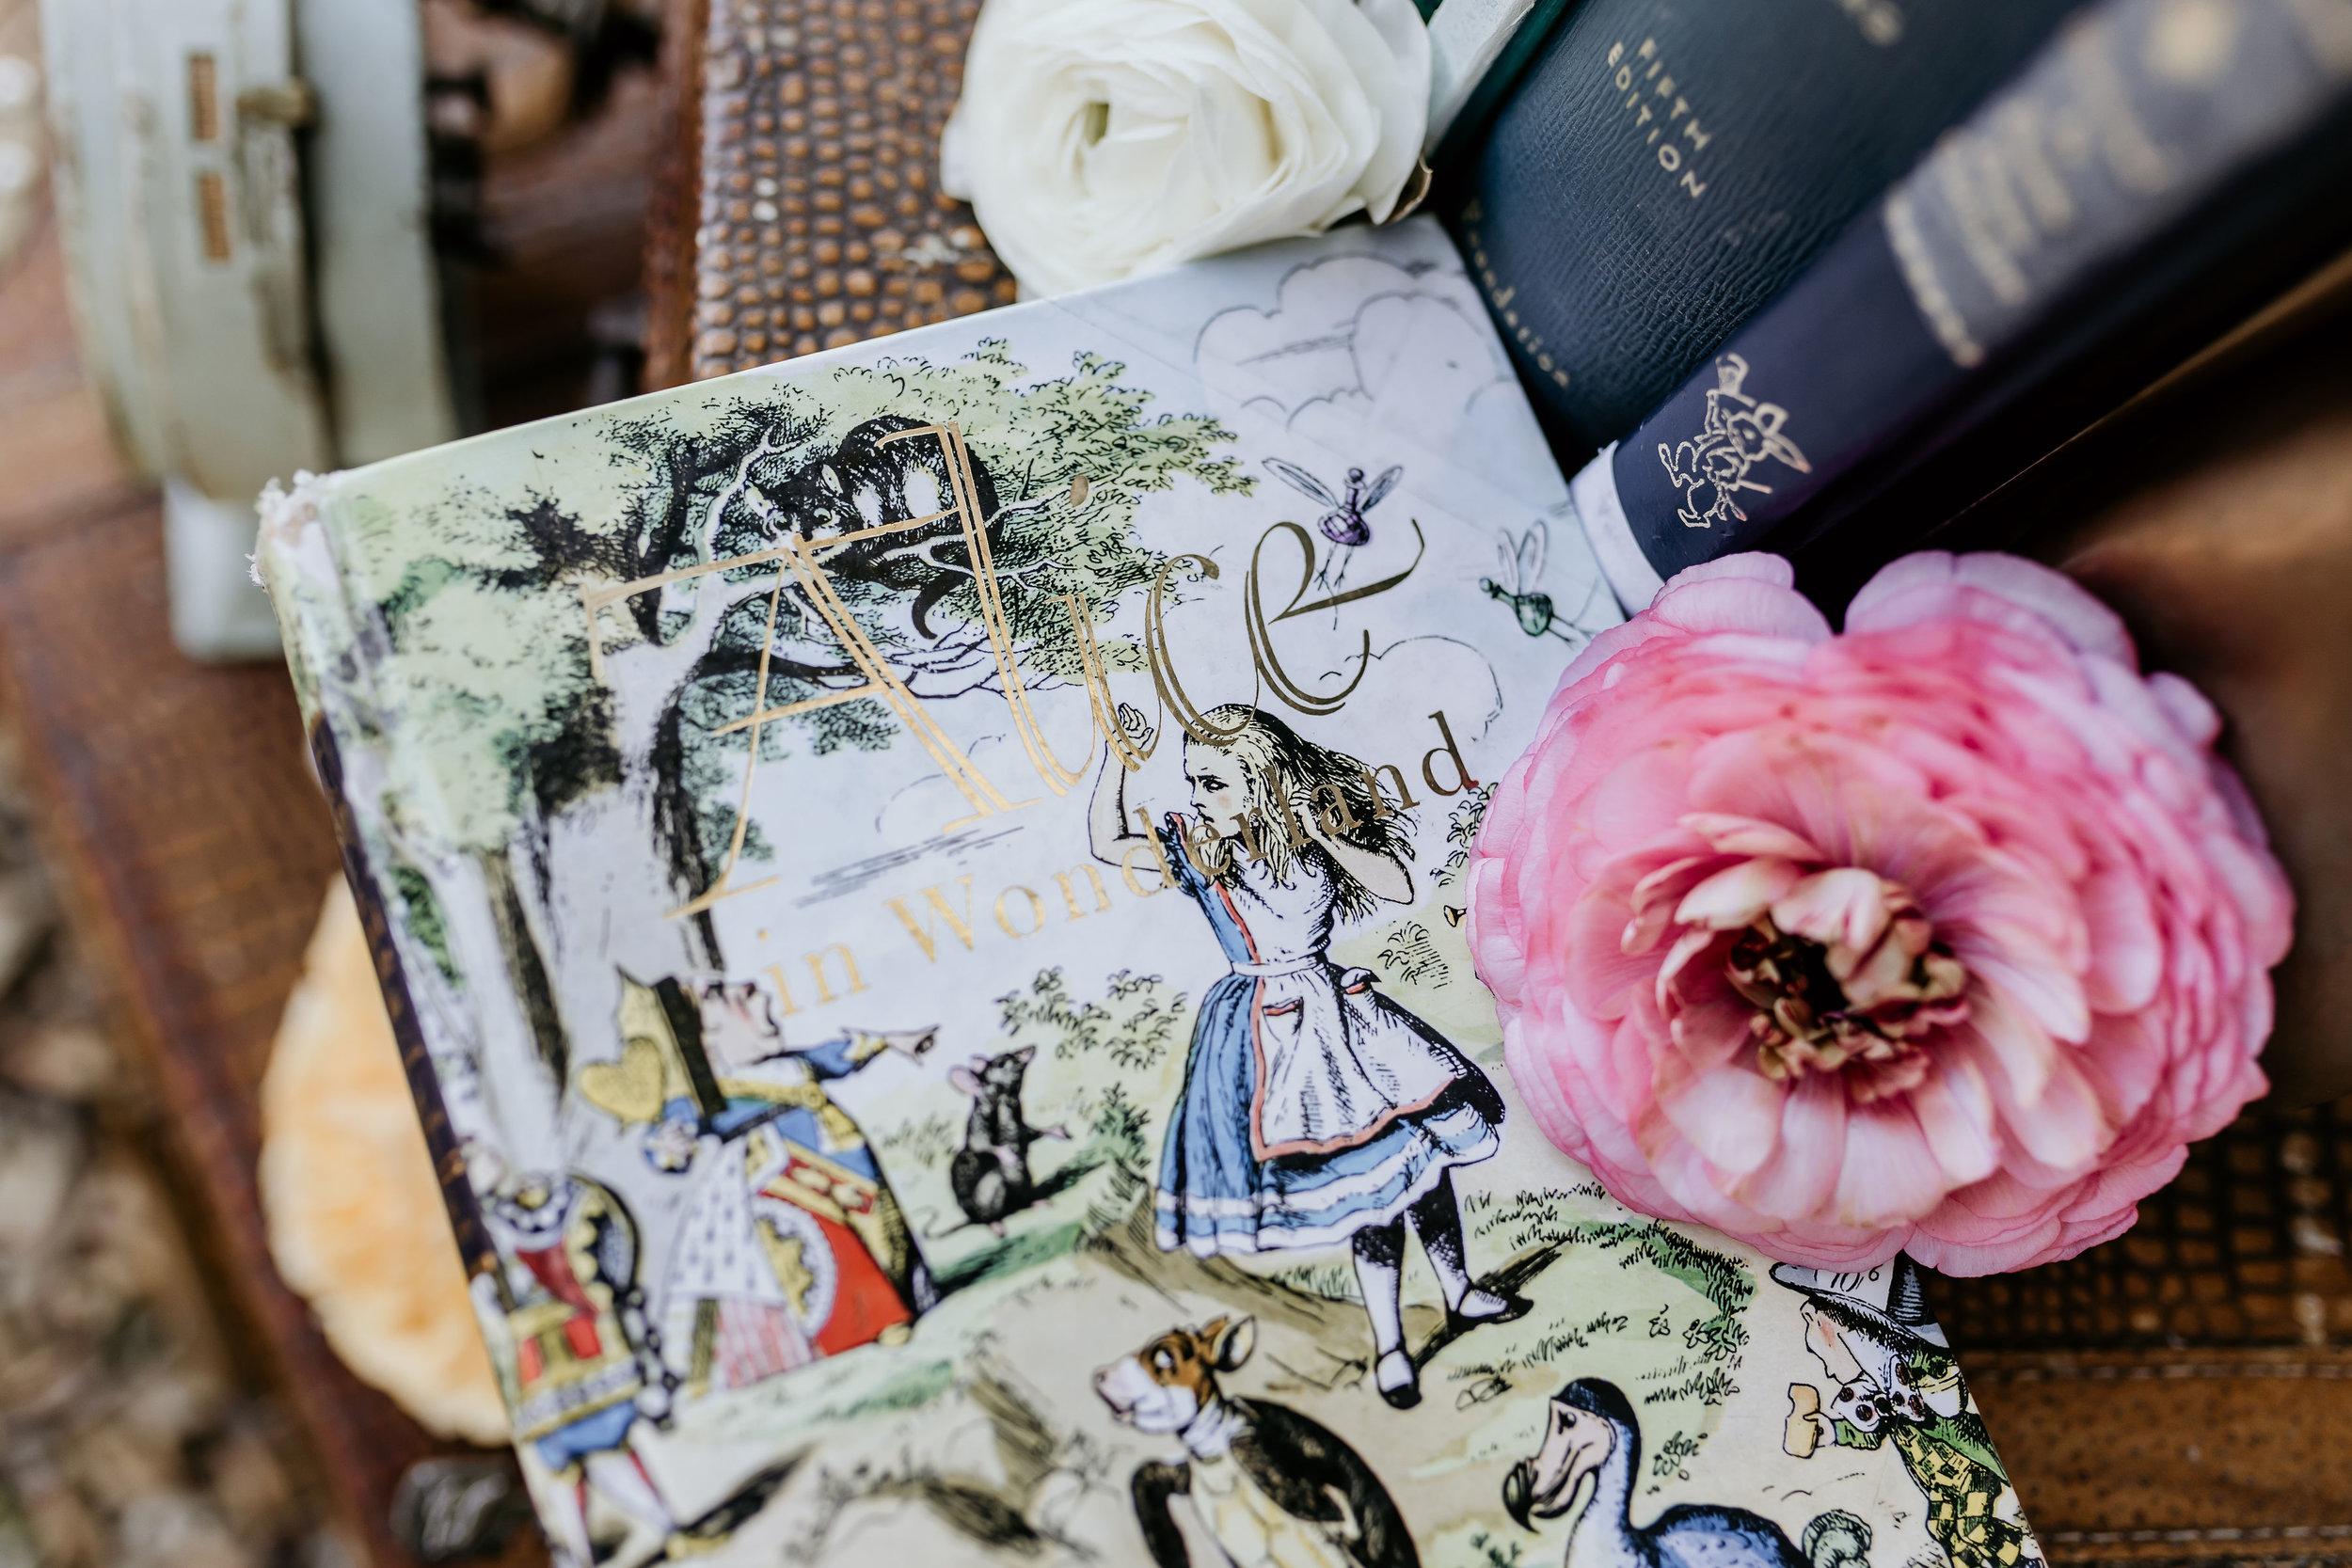 Vintage Alice in Wonderland book used as part of the props for the Alice in Wonderland vintage styled shoot at Chateau Adare in Murrieta.